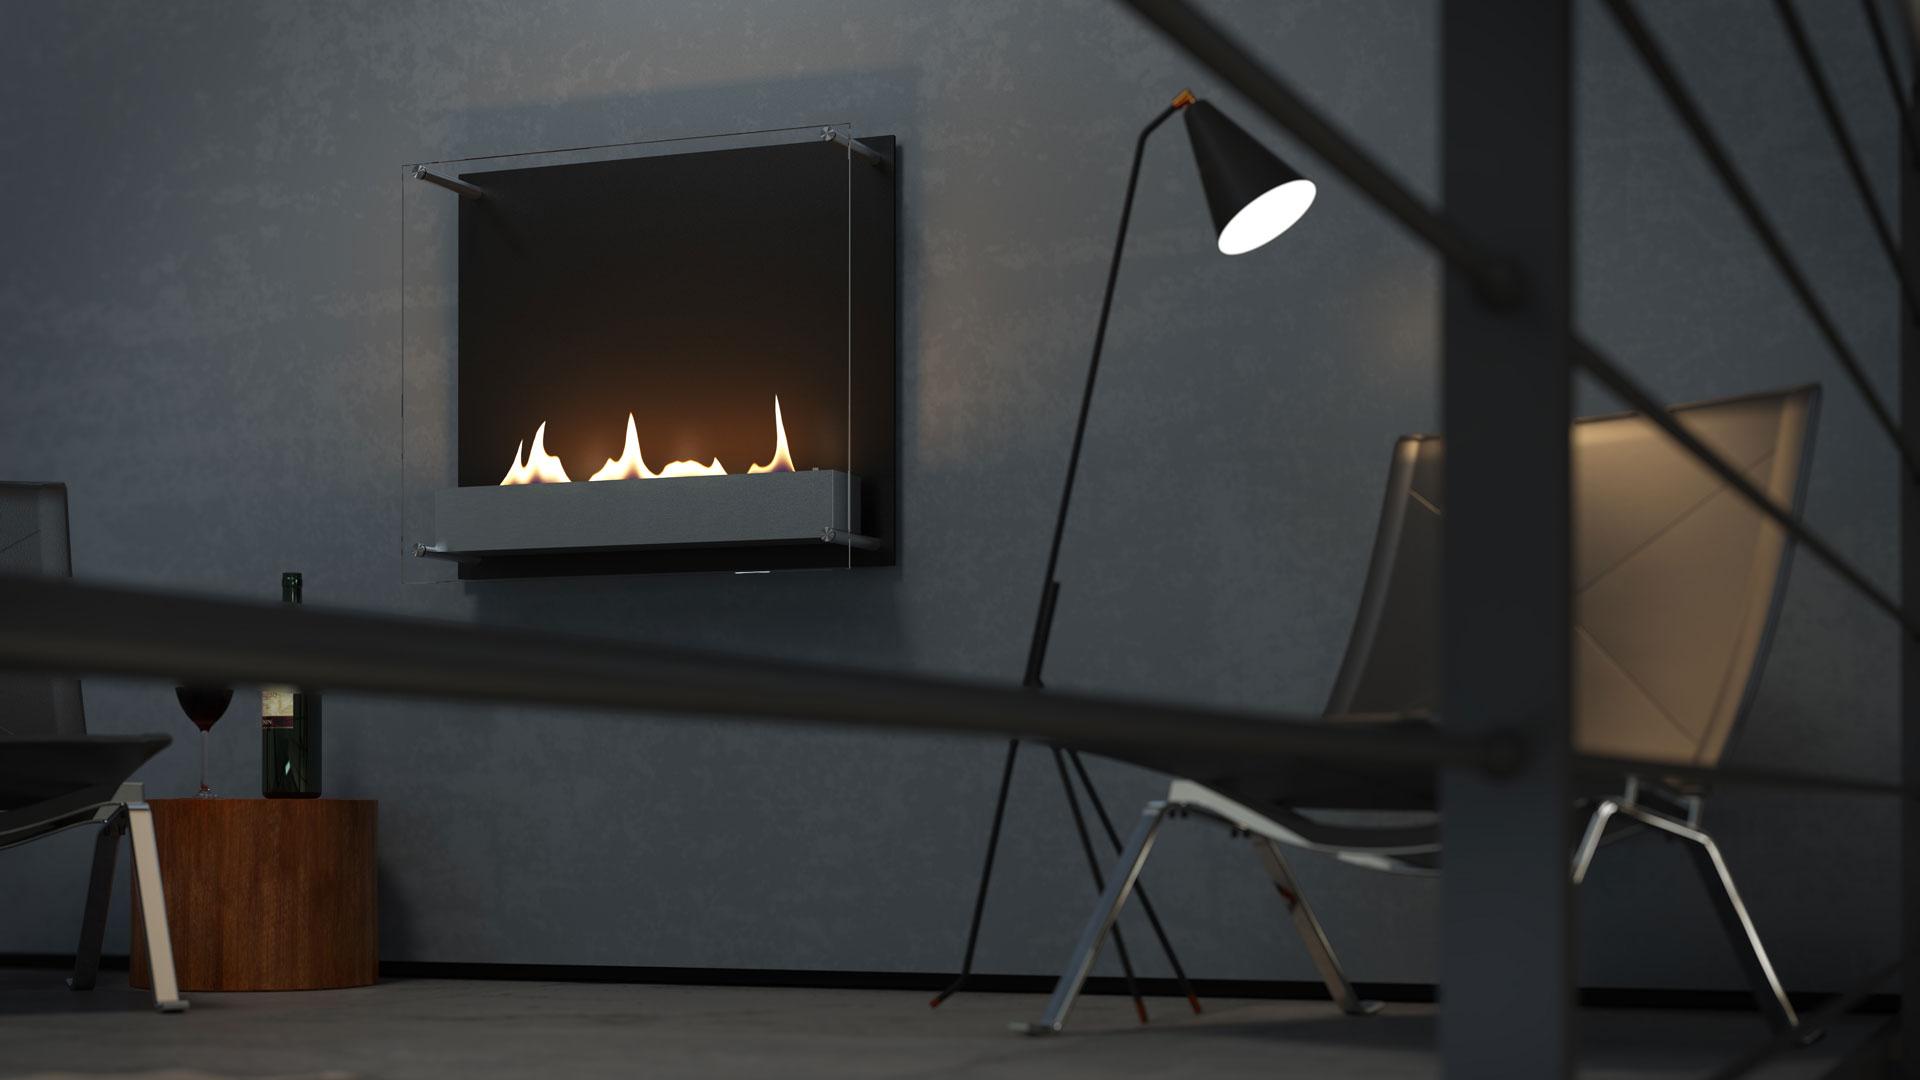 ofen wilms kamine heinsberg bioethanol kamine fen mehr. Black Bedroom Furniture Sets. Home Design Ideas